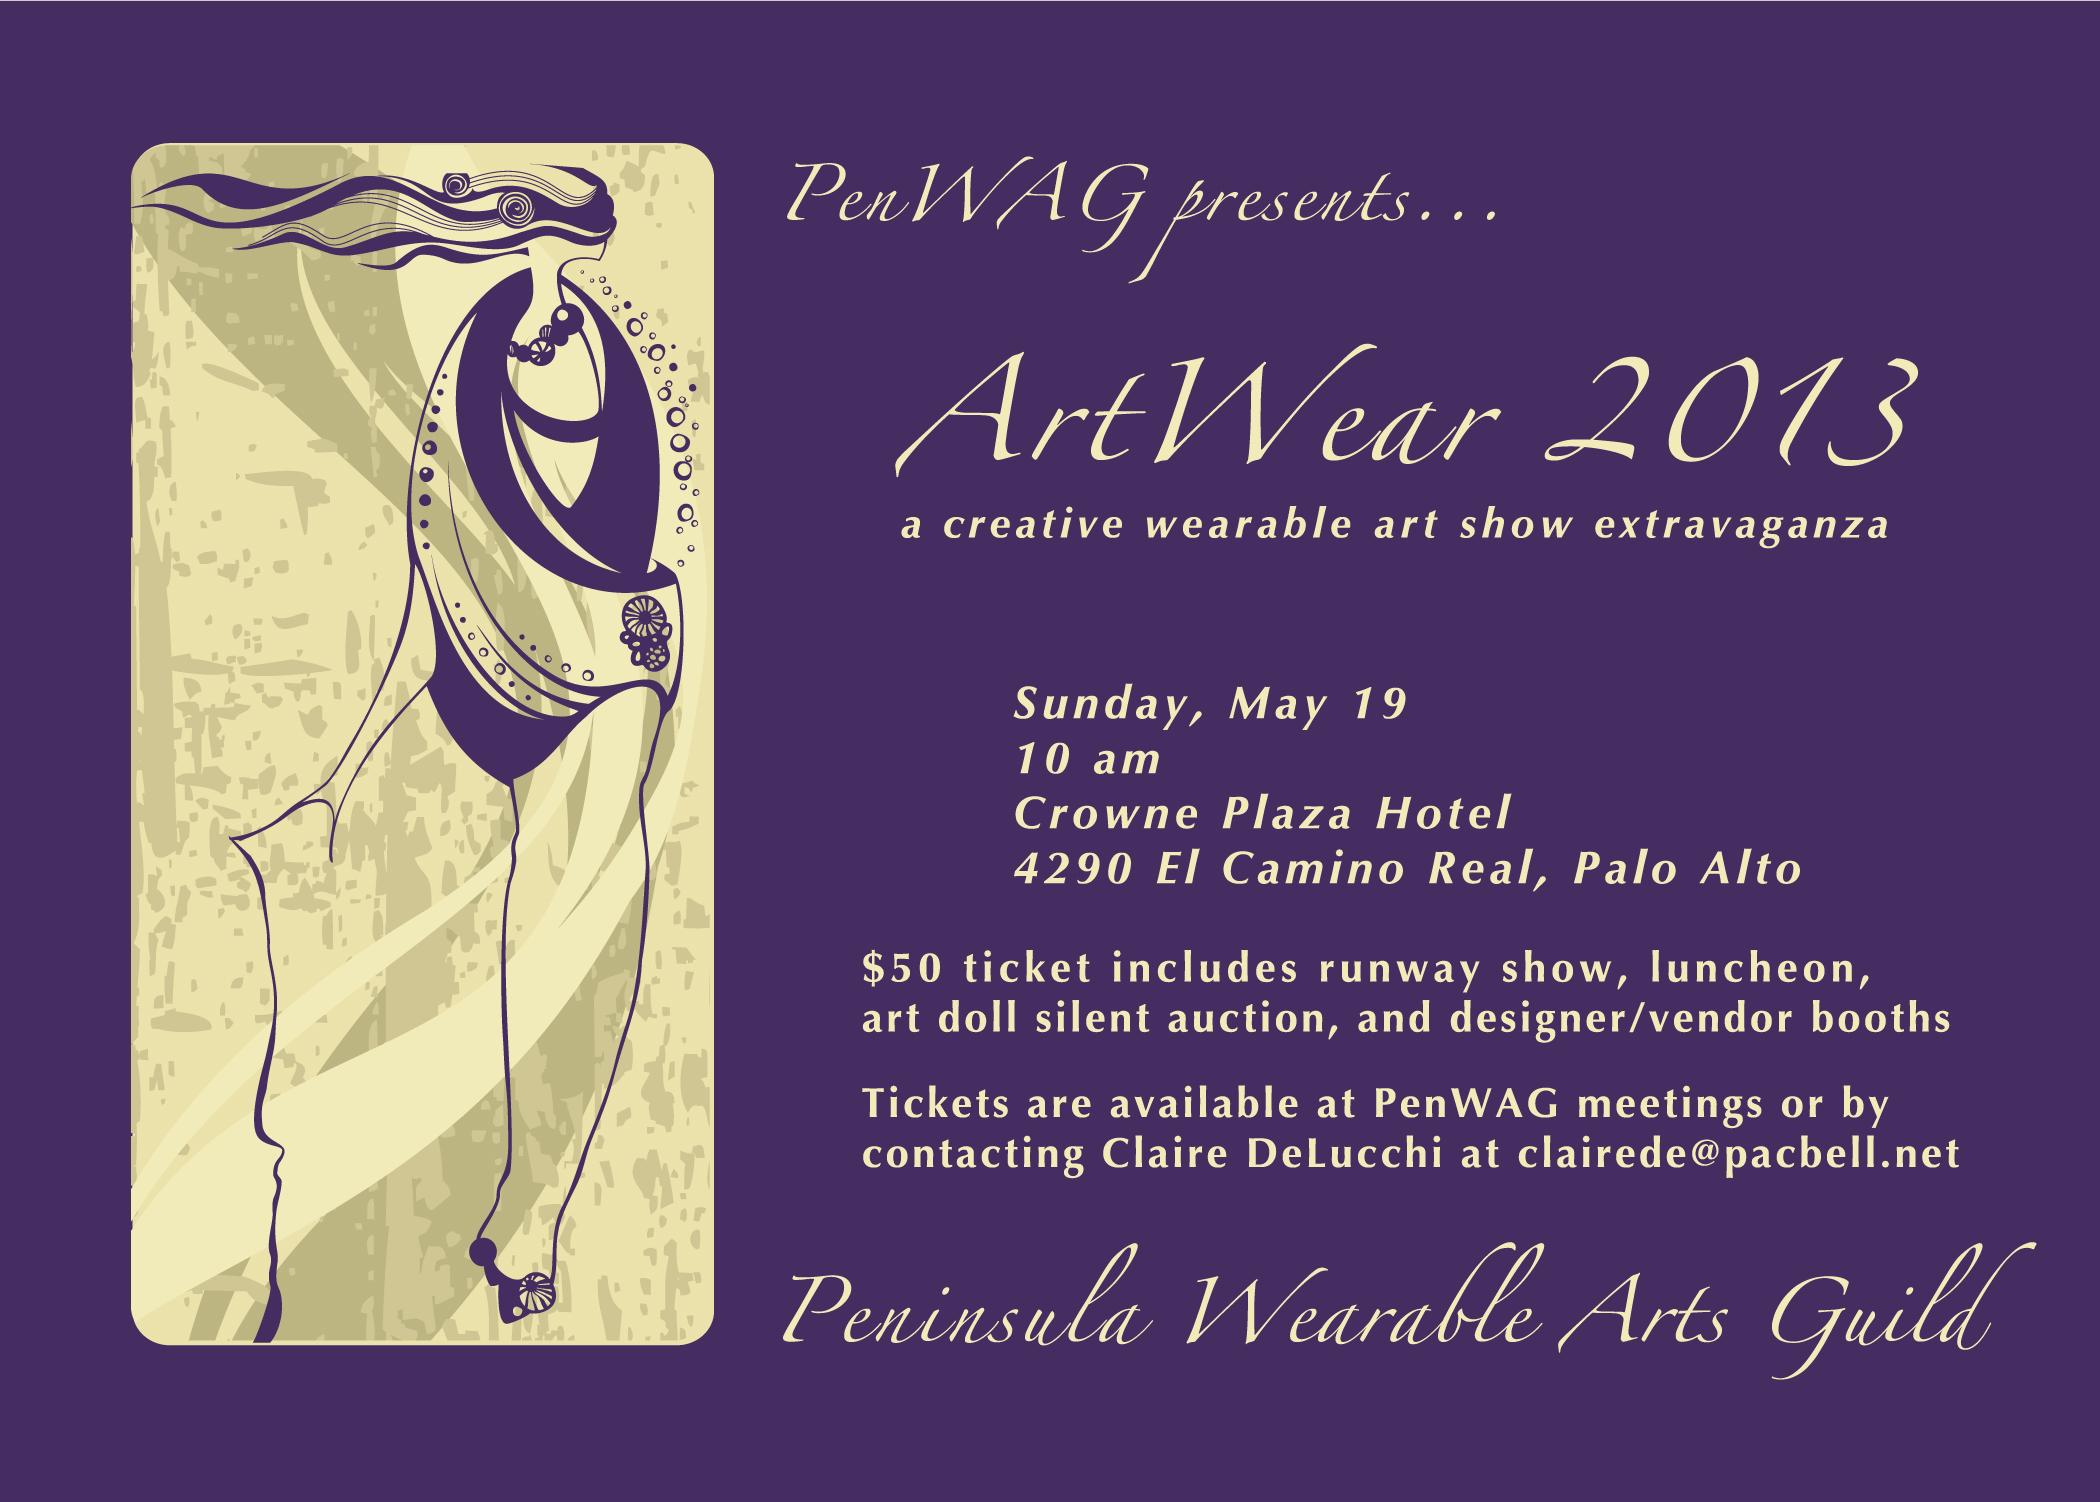 ArtWear 2013 elex postcard